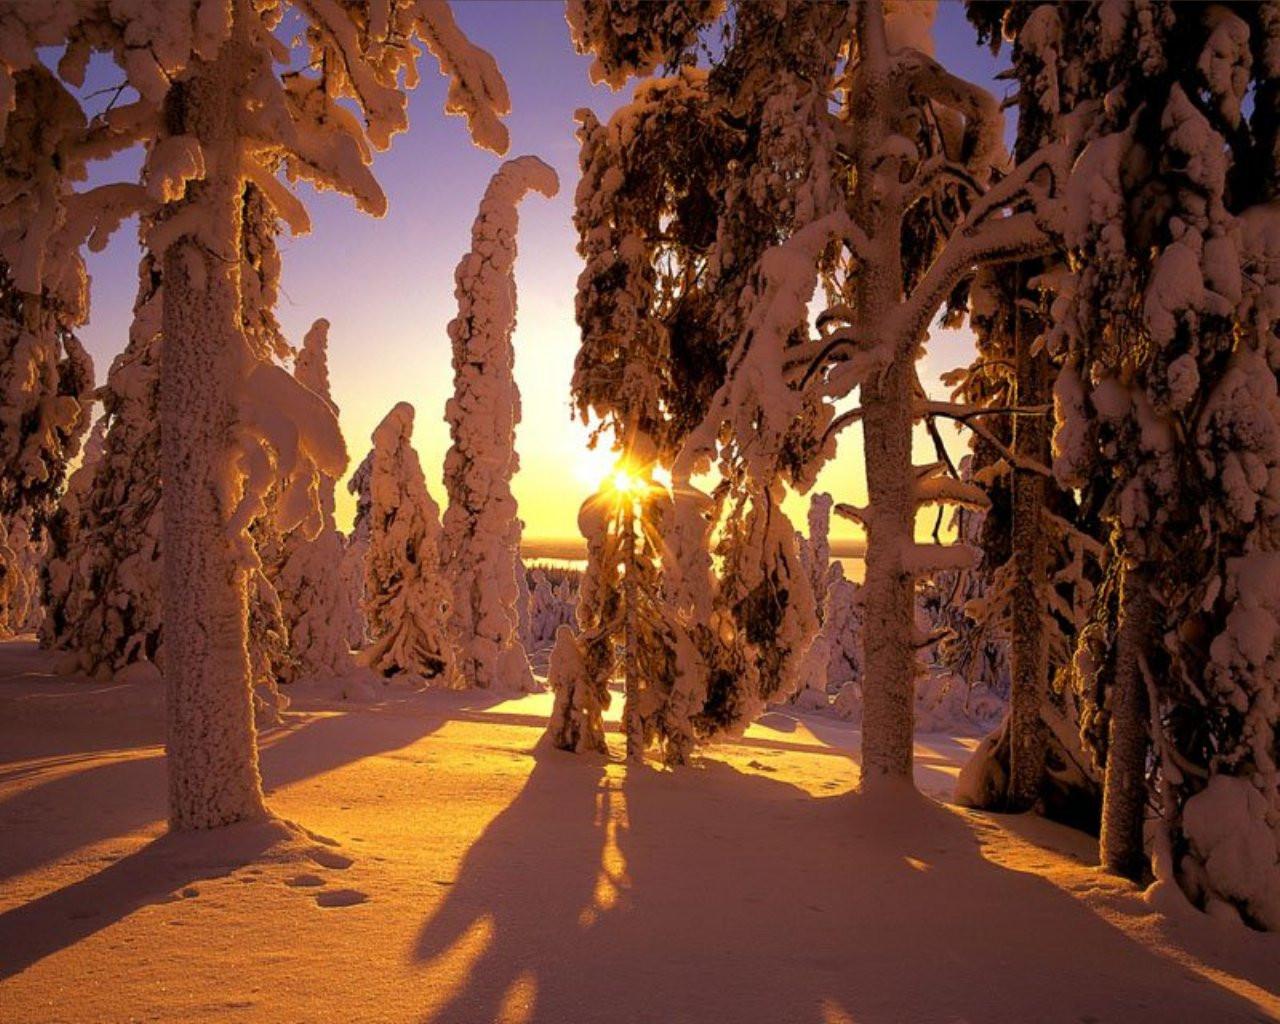 ws_Winter_forest_view_1280x1024.jpg